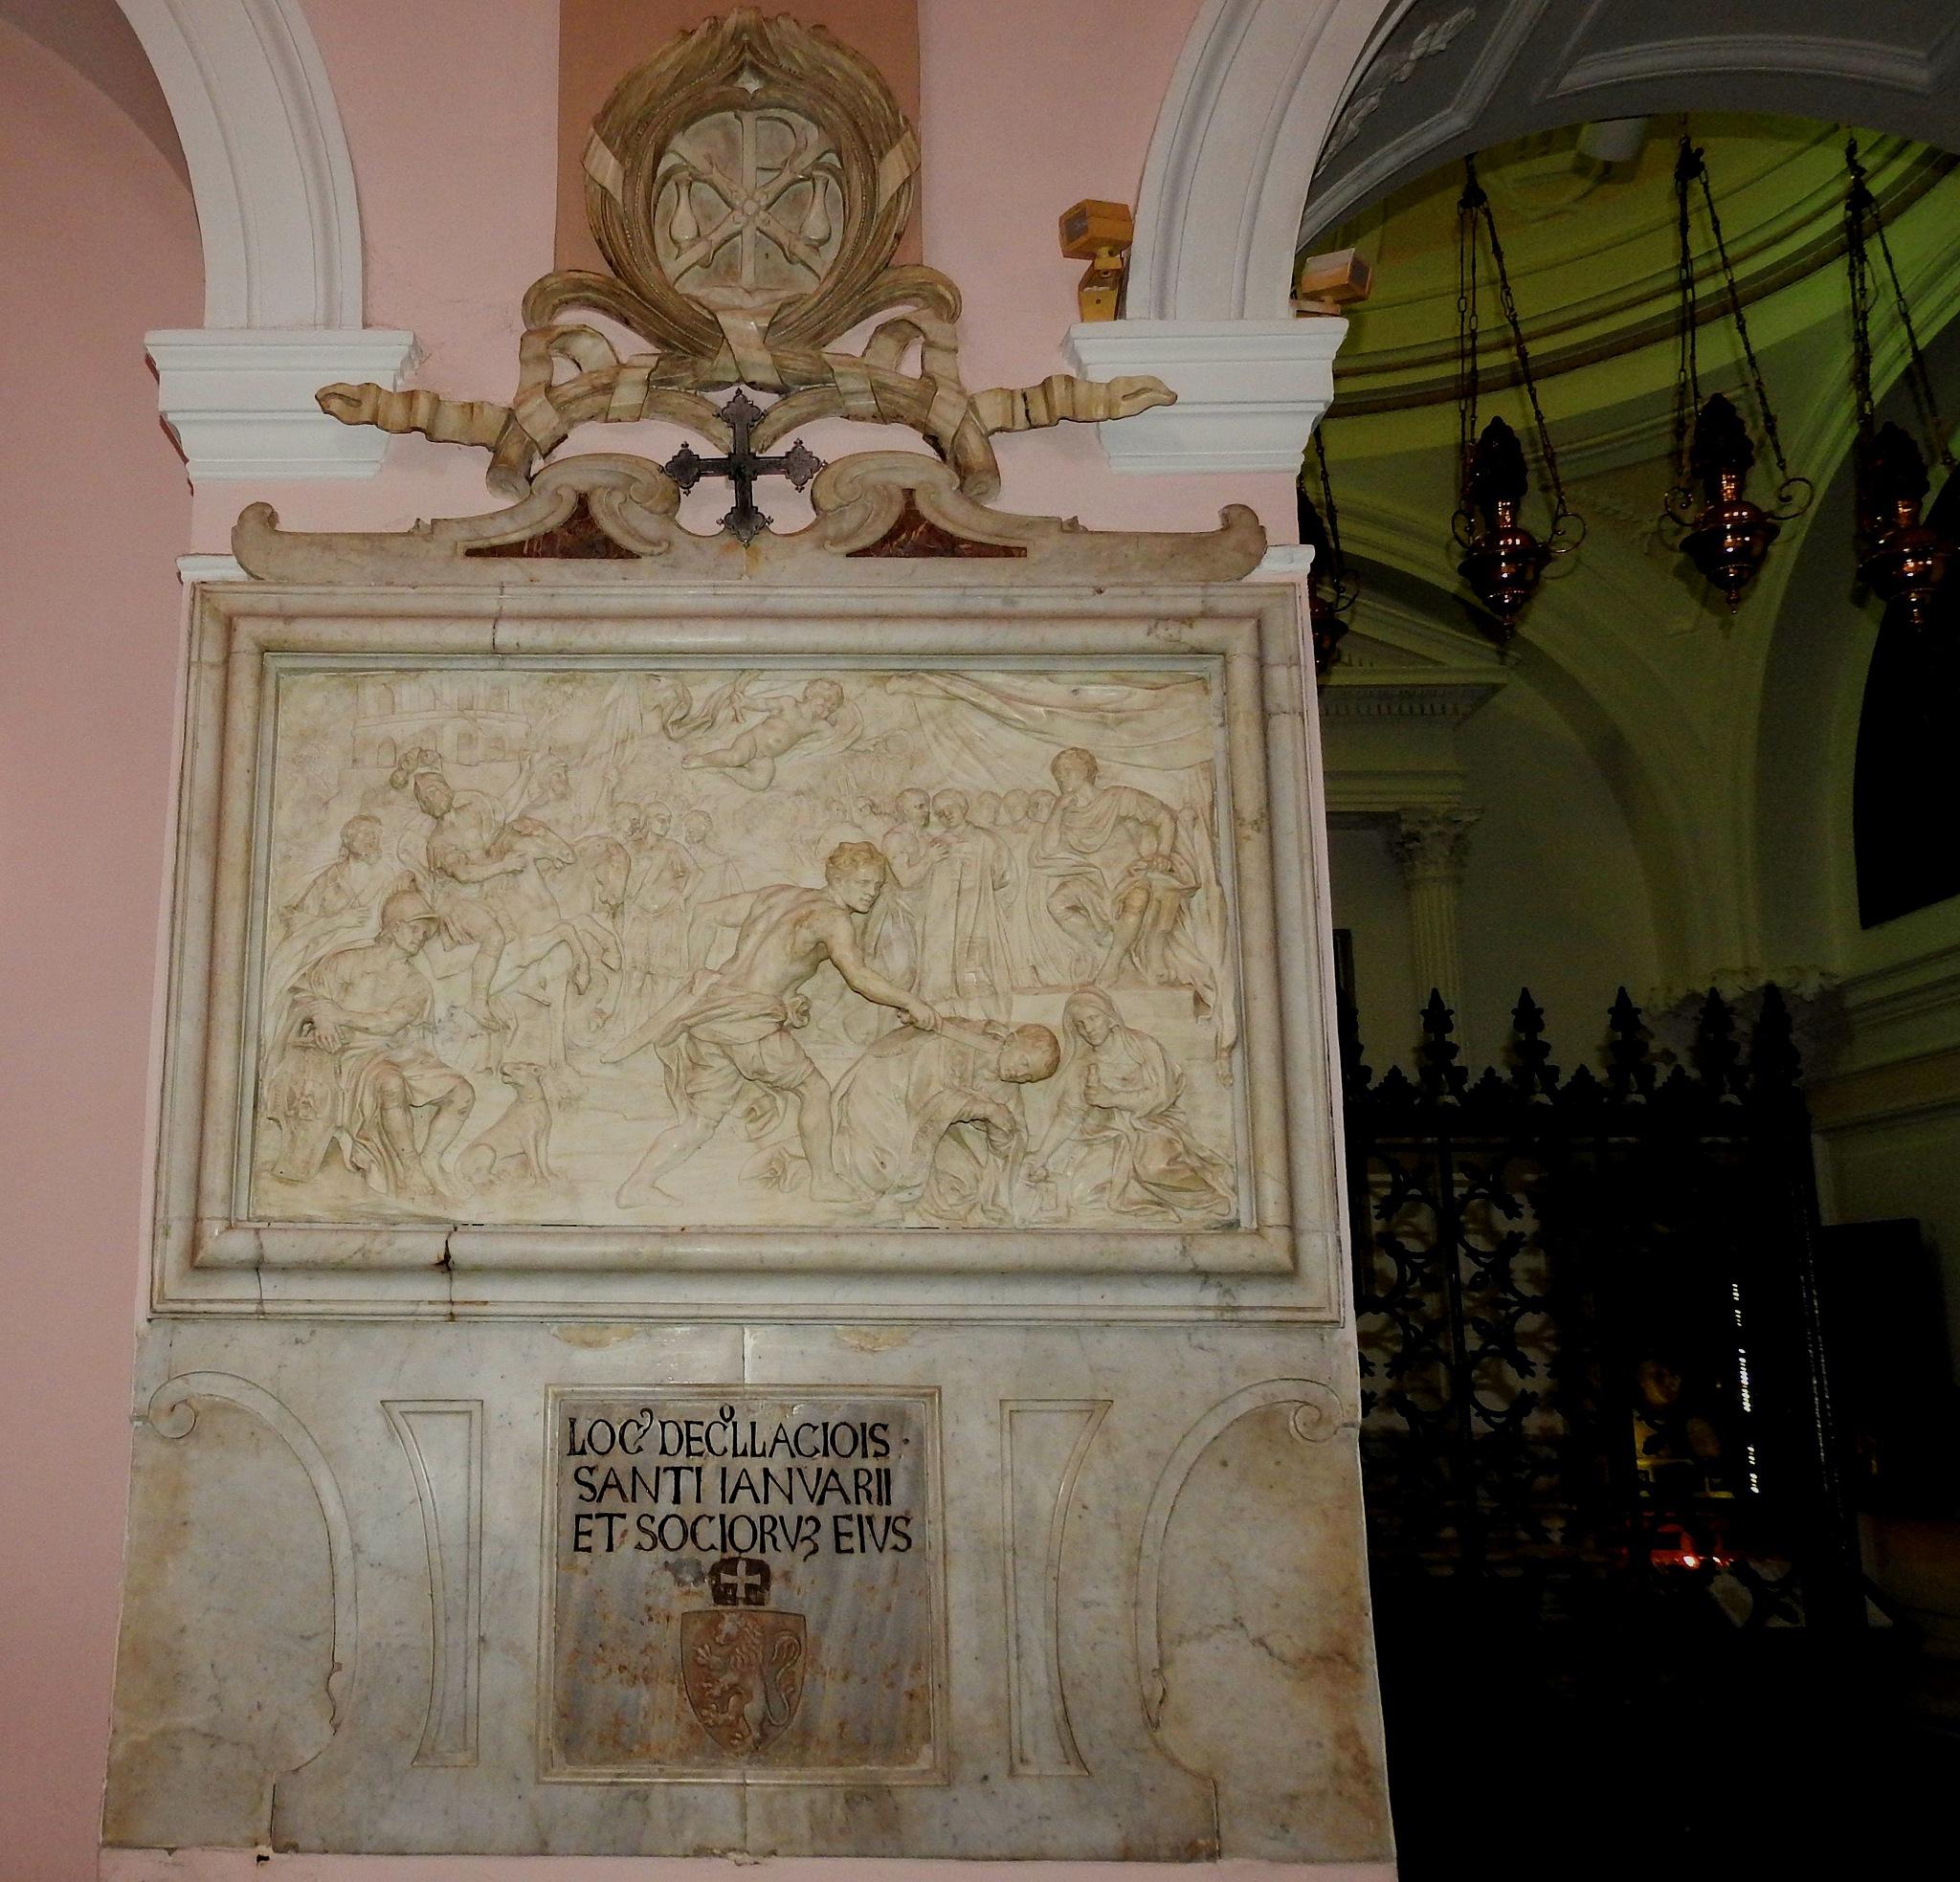 Pozzuoli Naples - Saint Gennaro Church - Martyrdom of Saint Gennaro   by Delirium Tremends 62